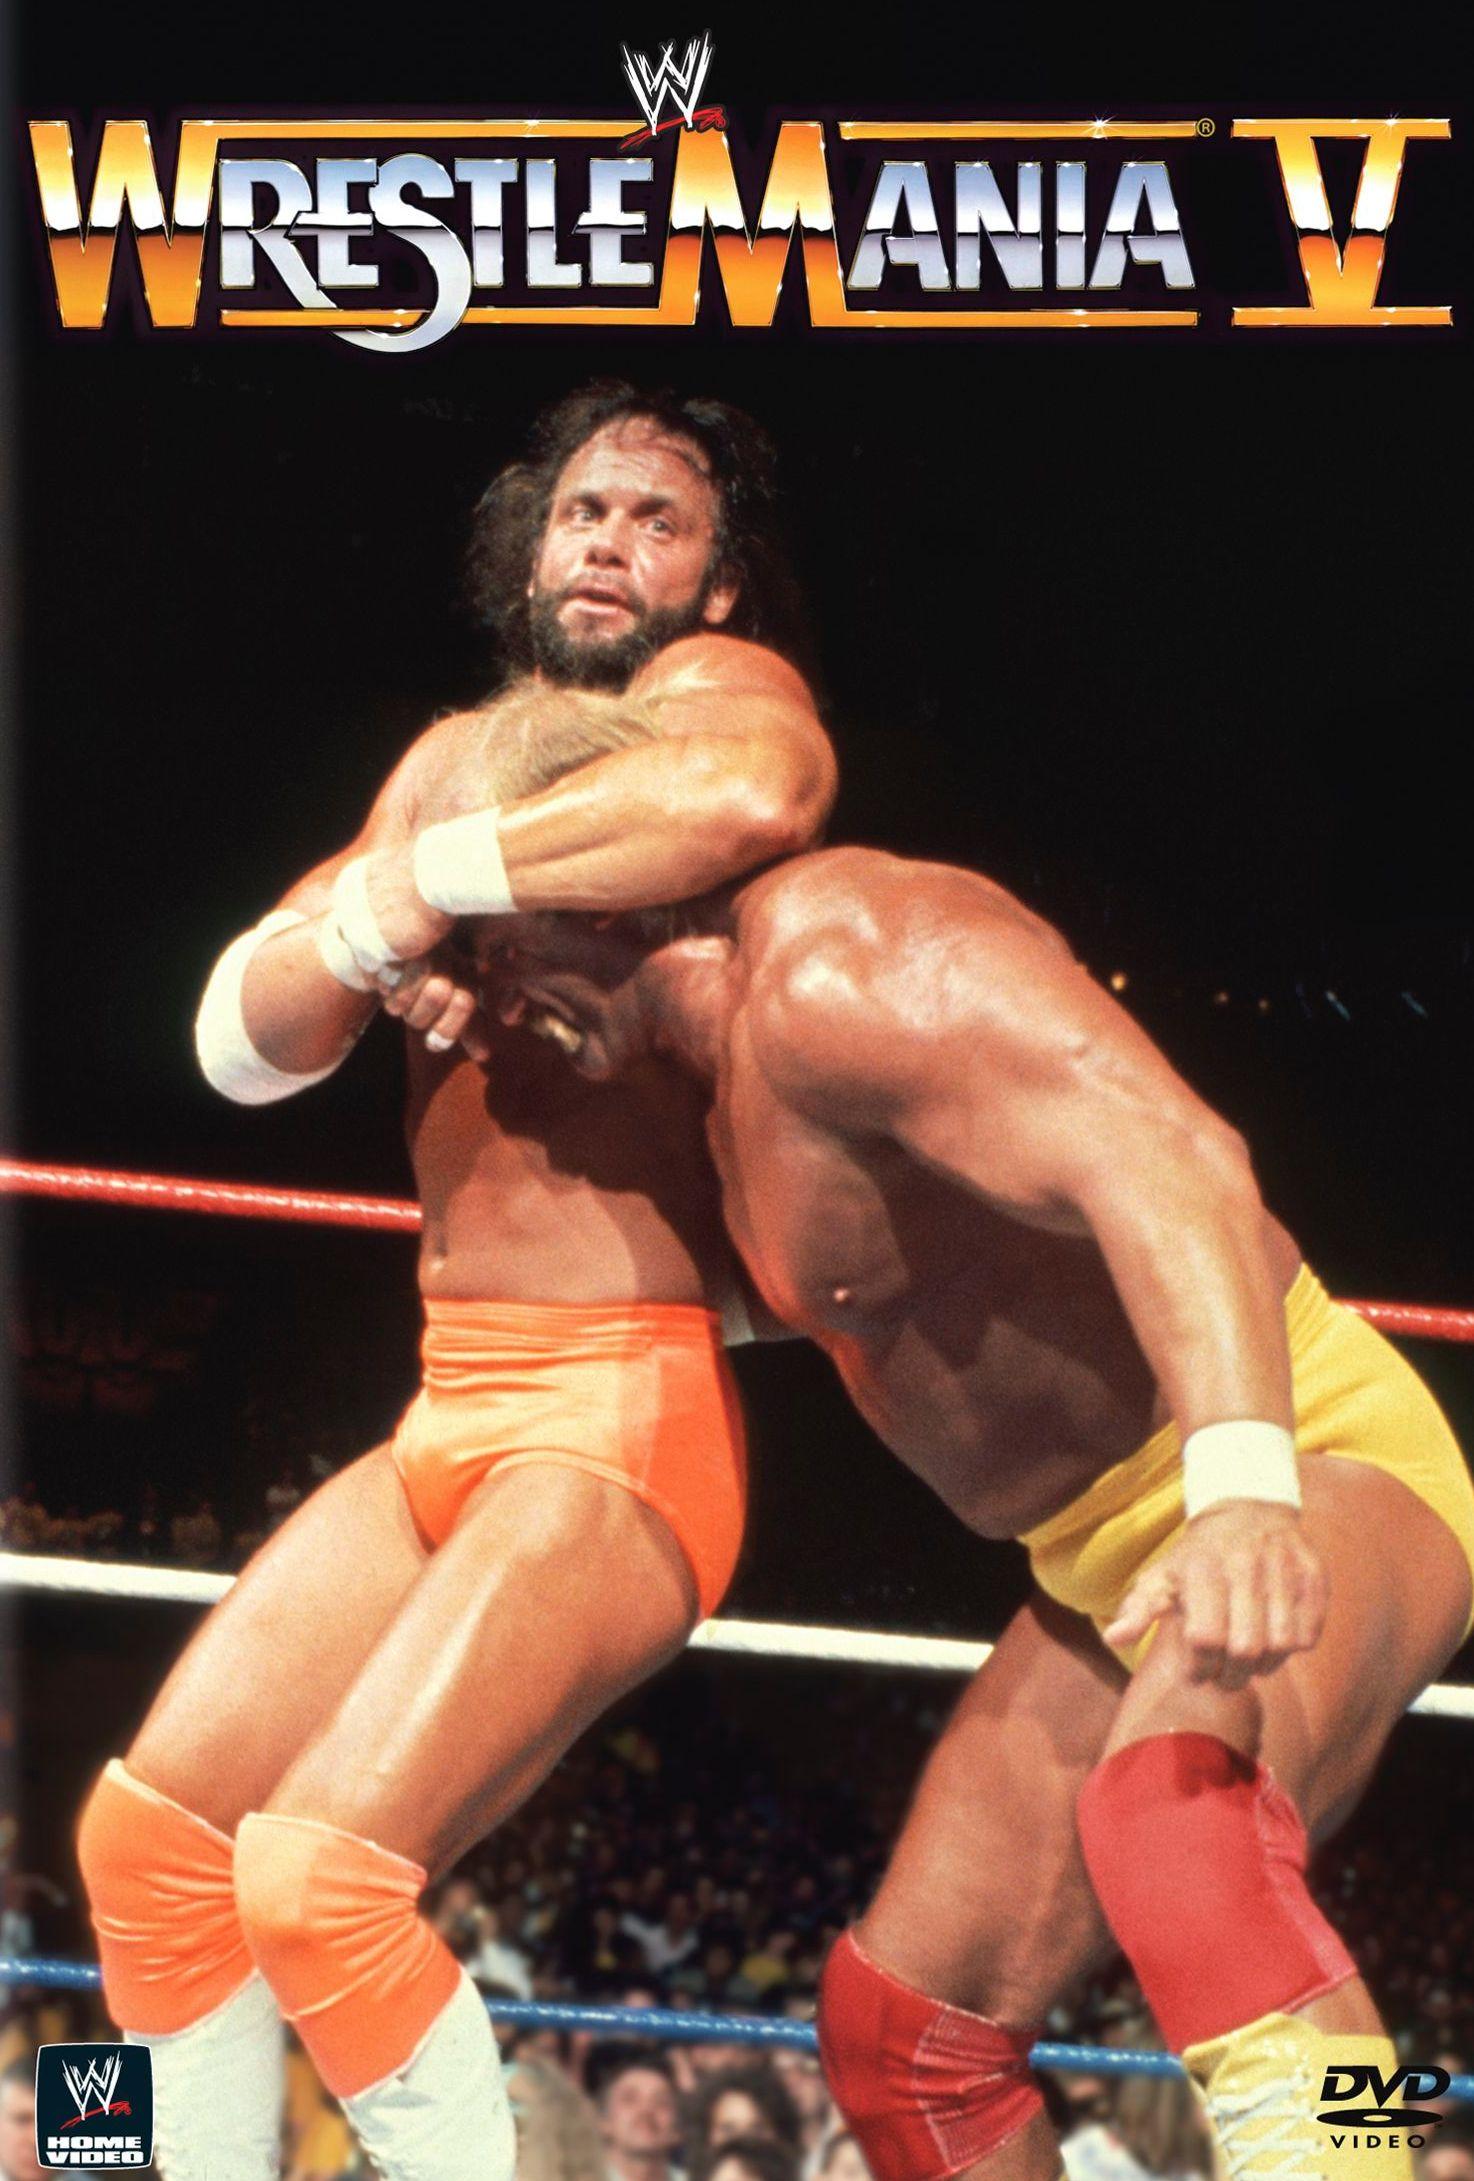 WWE: Wrestlemania V